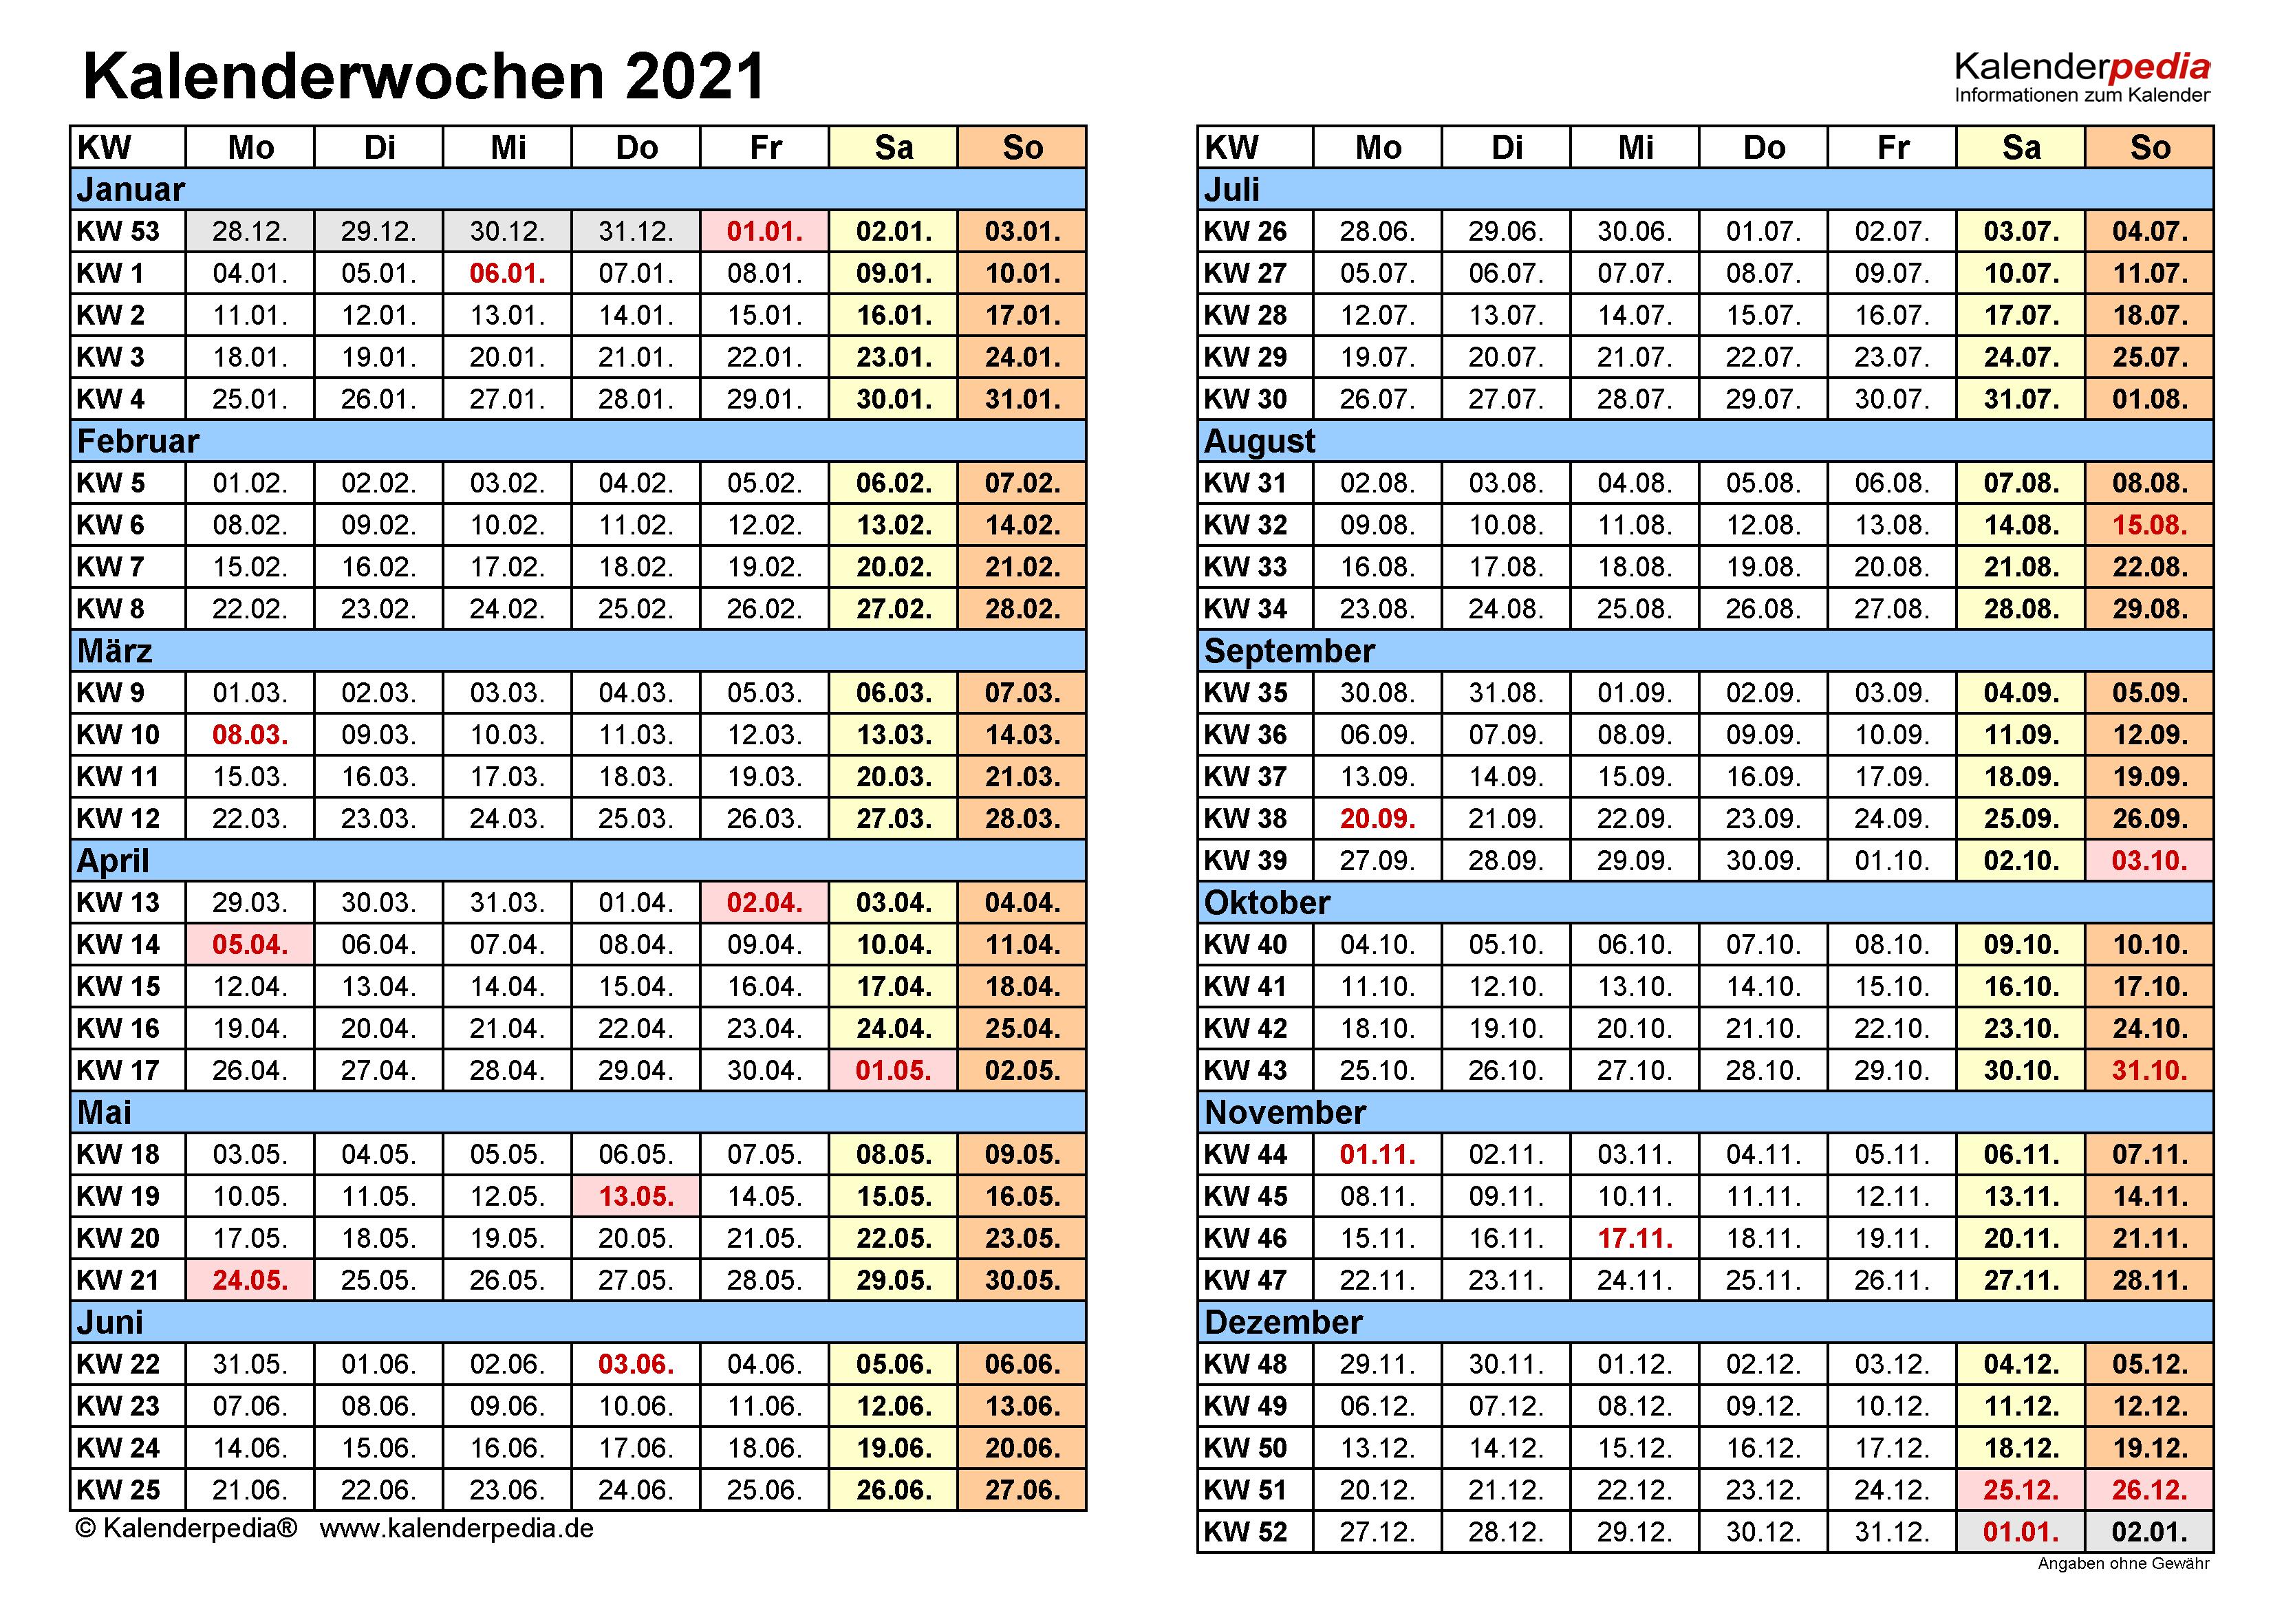 Aktuelle Kalenderwoche 2021 / Iphone Kalenderwochen ...